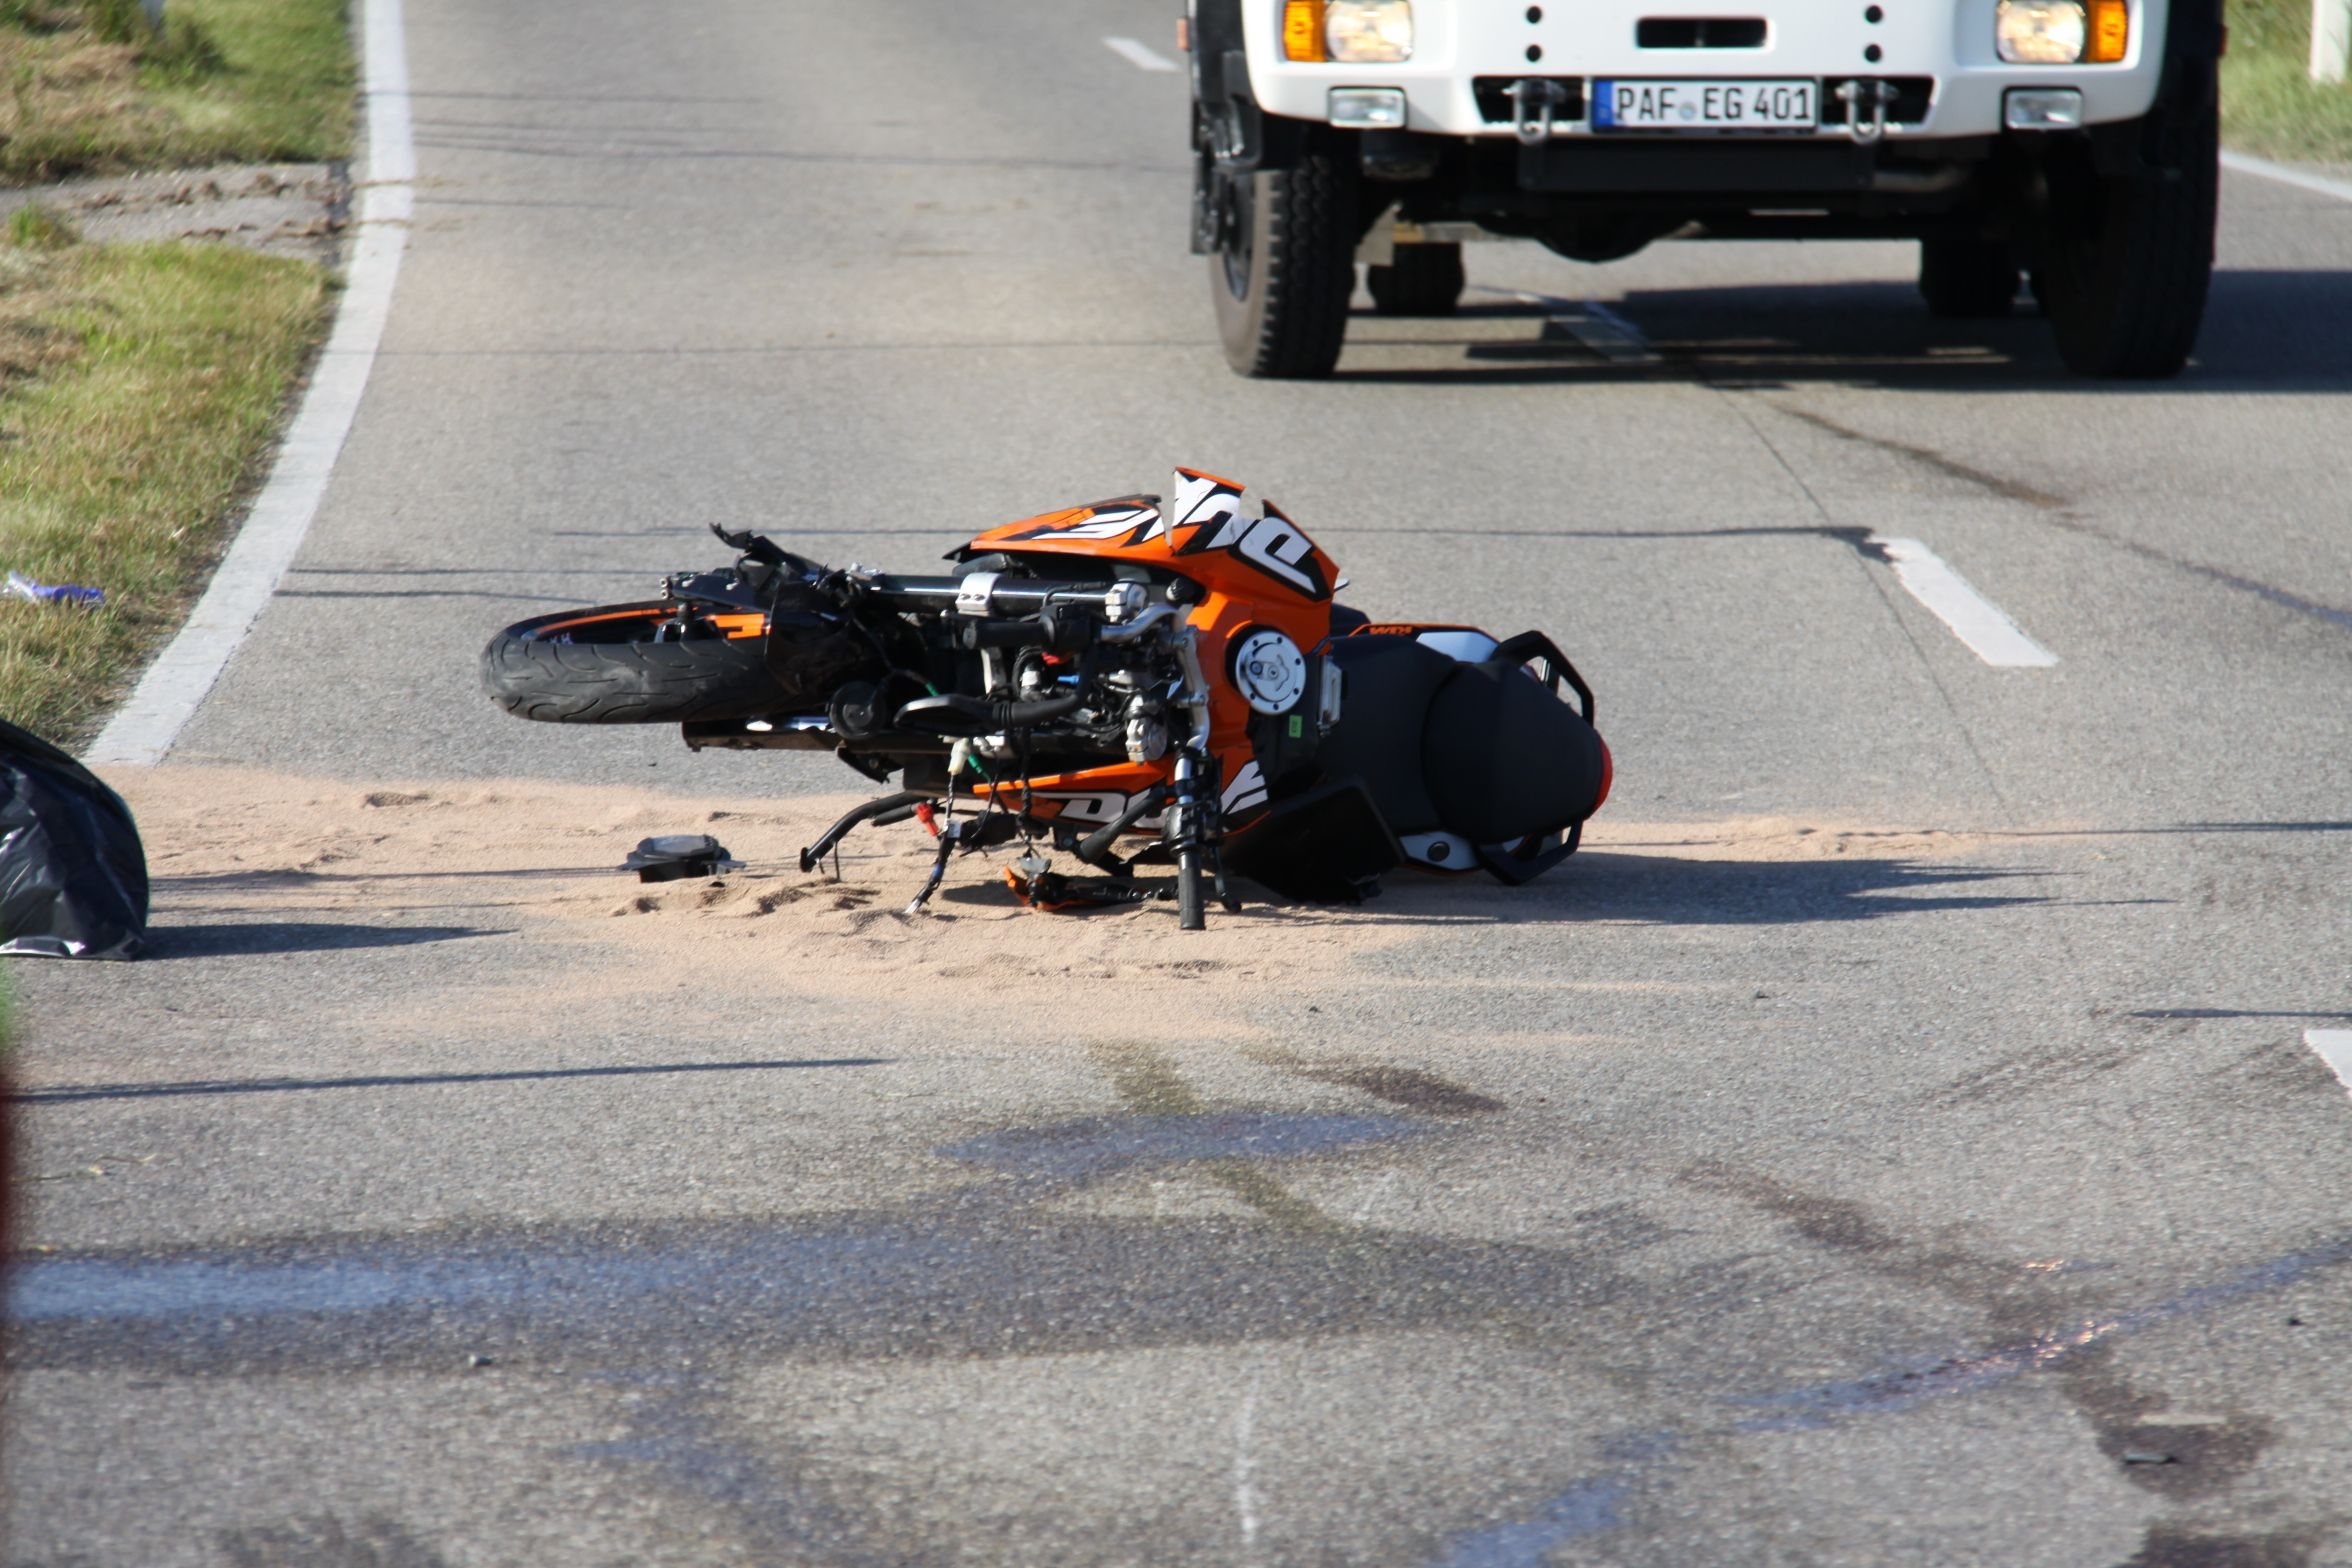 210906 Vifogra Unfall St2335 Grossmehring 07